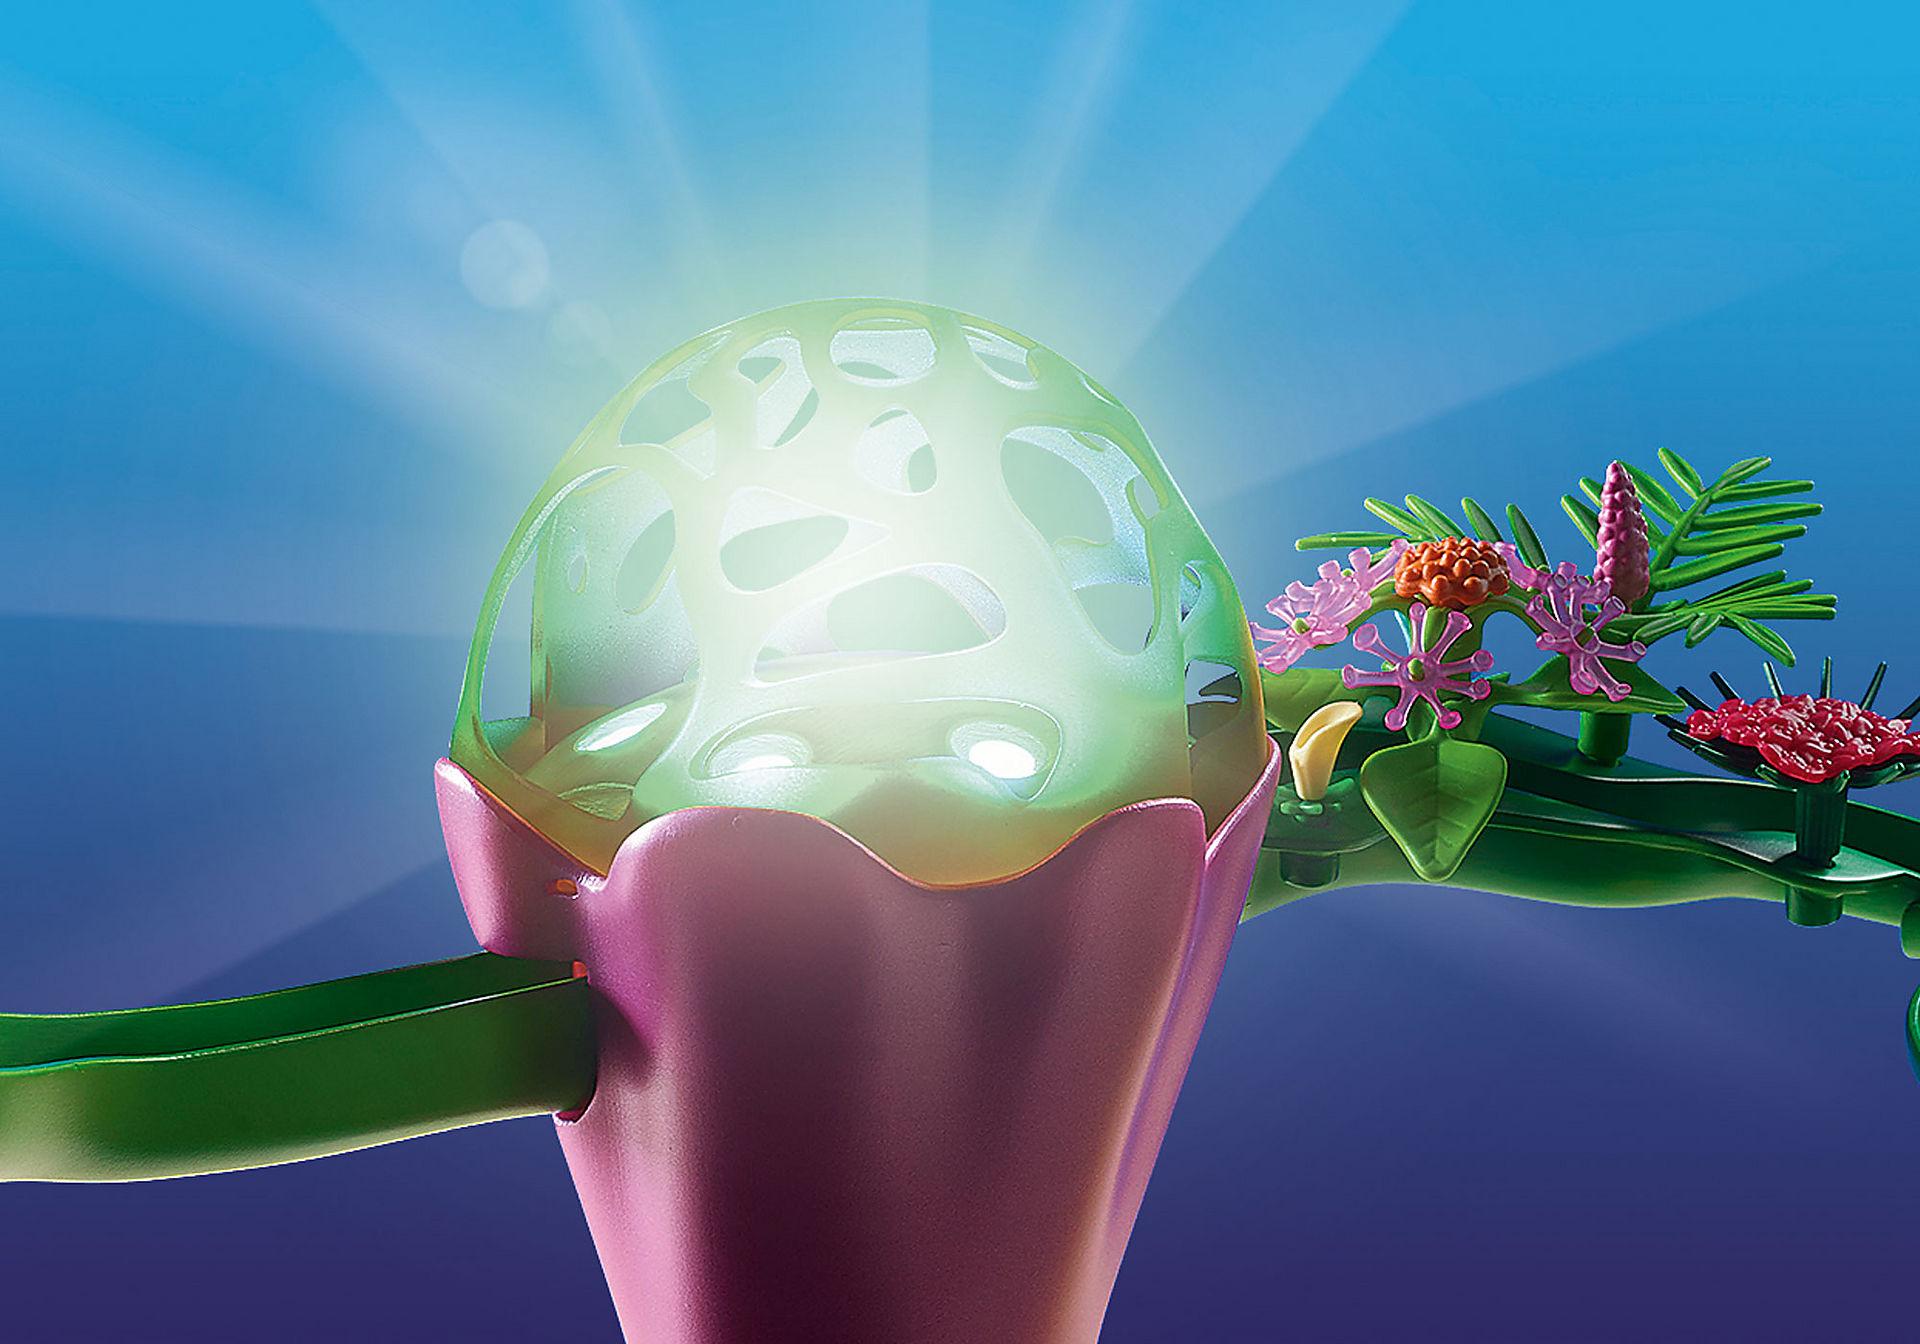 70094 Korallenpavillon mit Leuchtkuppel zoom image6